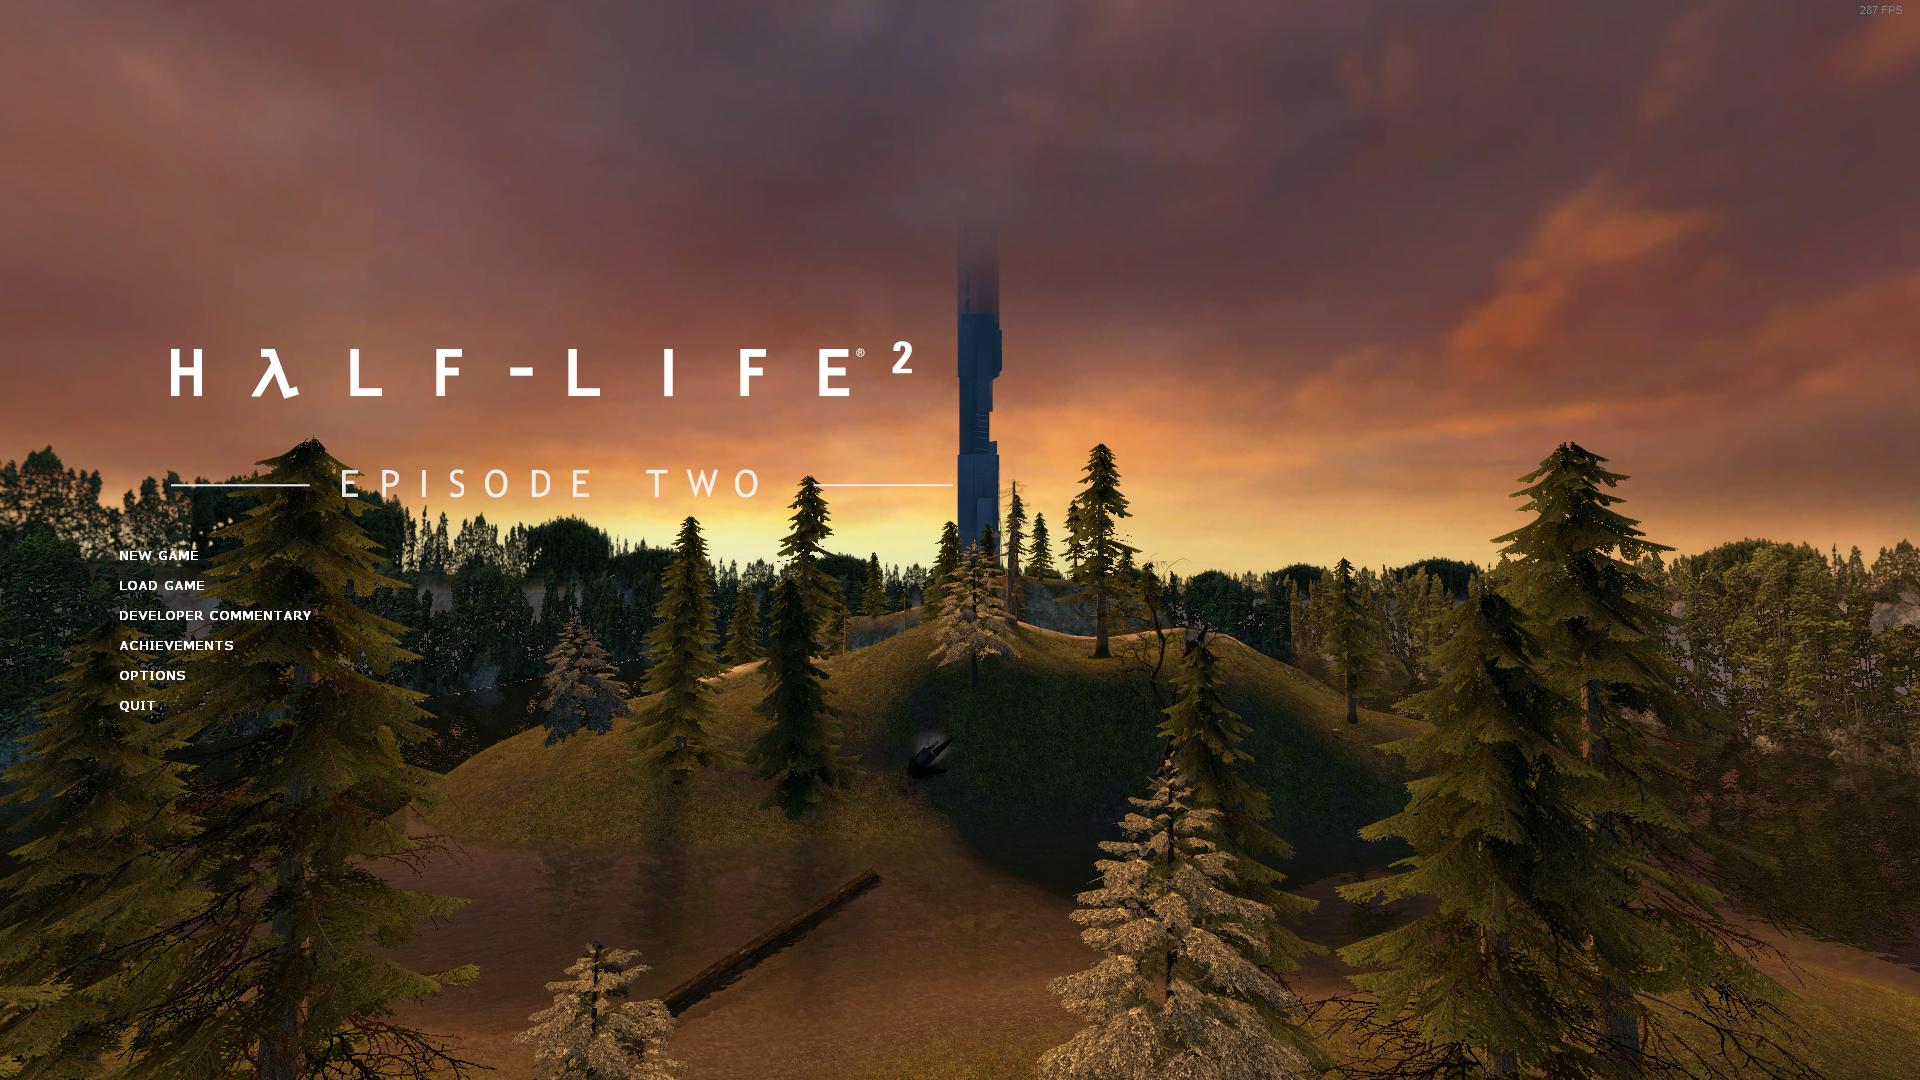 Background Map Image Half Life 2 Unforeseen Circumstances